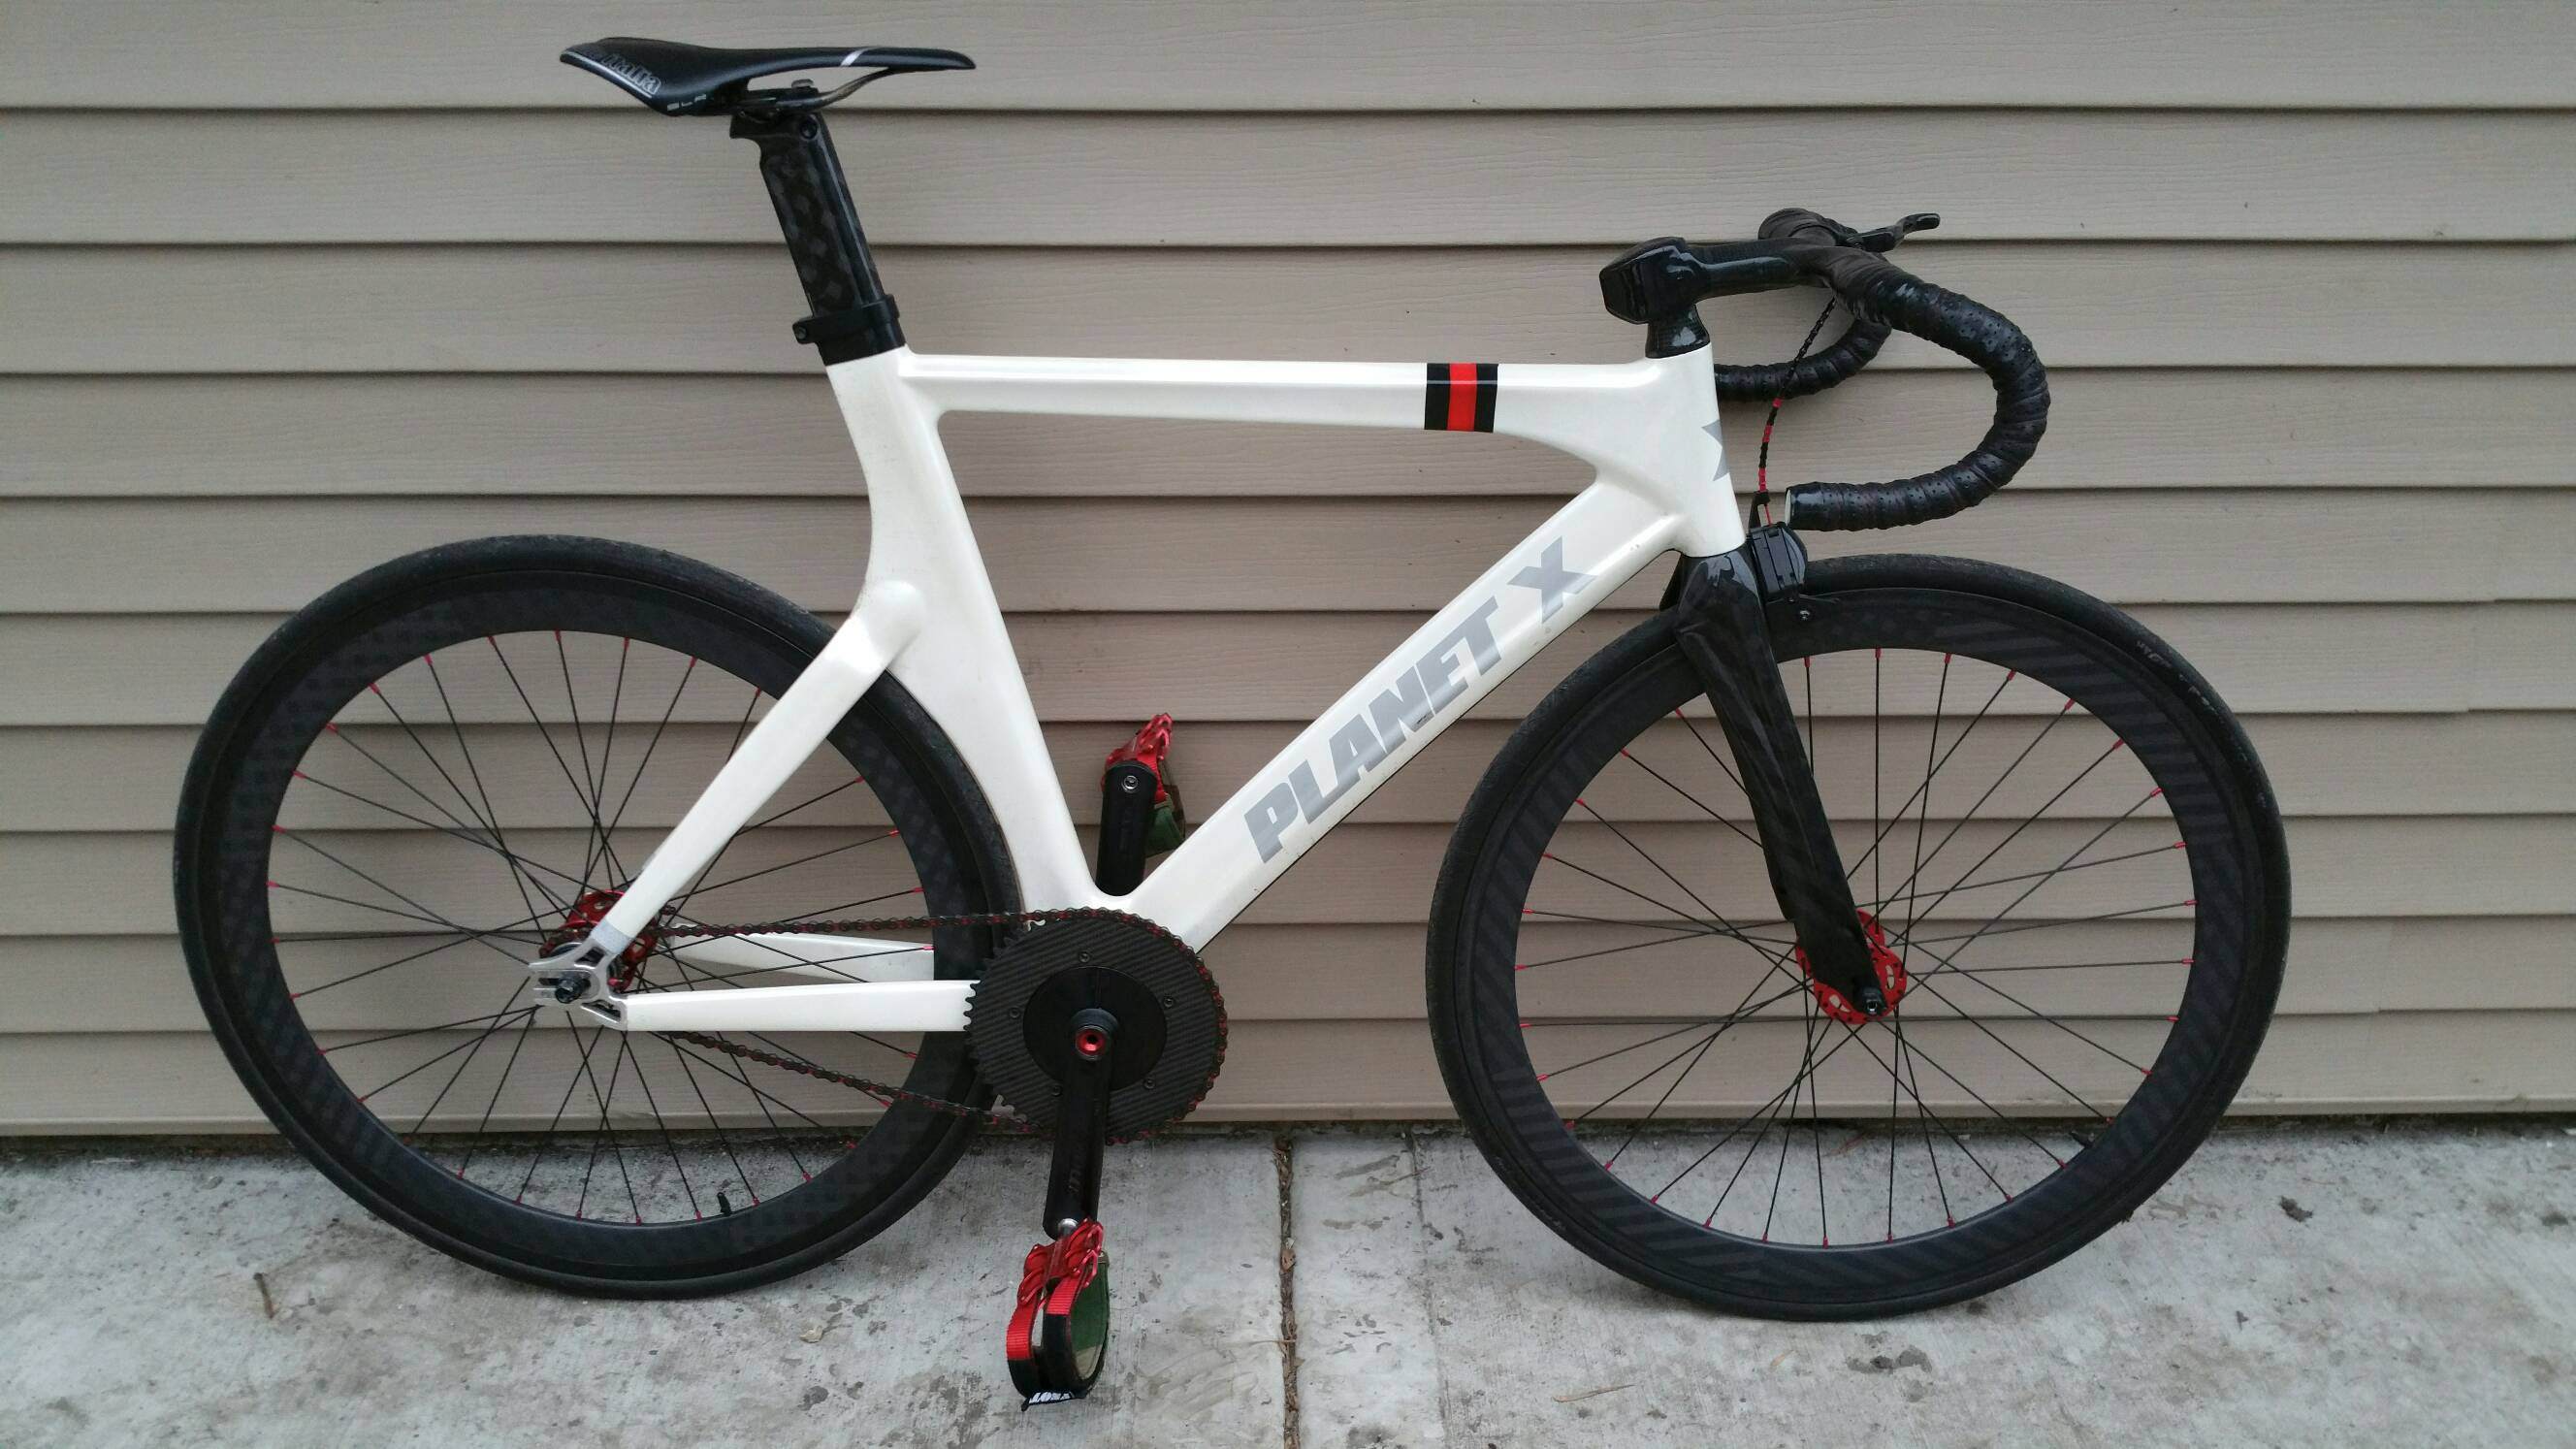 Planet x Pro Carbon Track bike (pearl white, frame) | Chicago Stolen ...